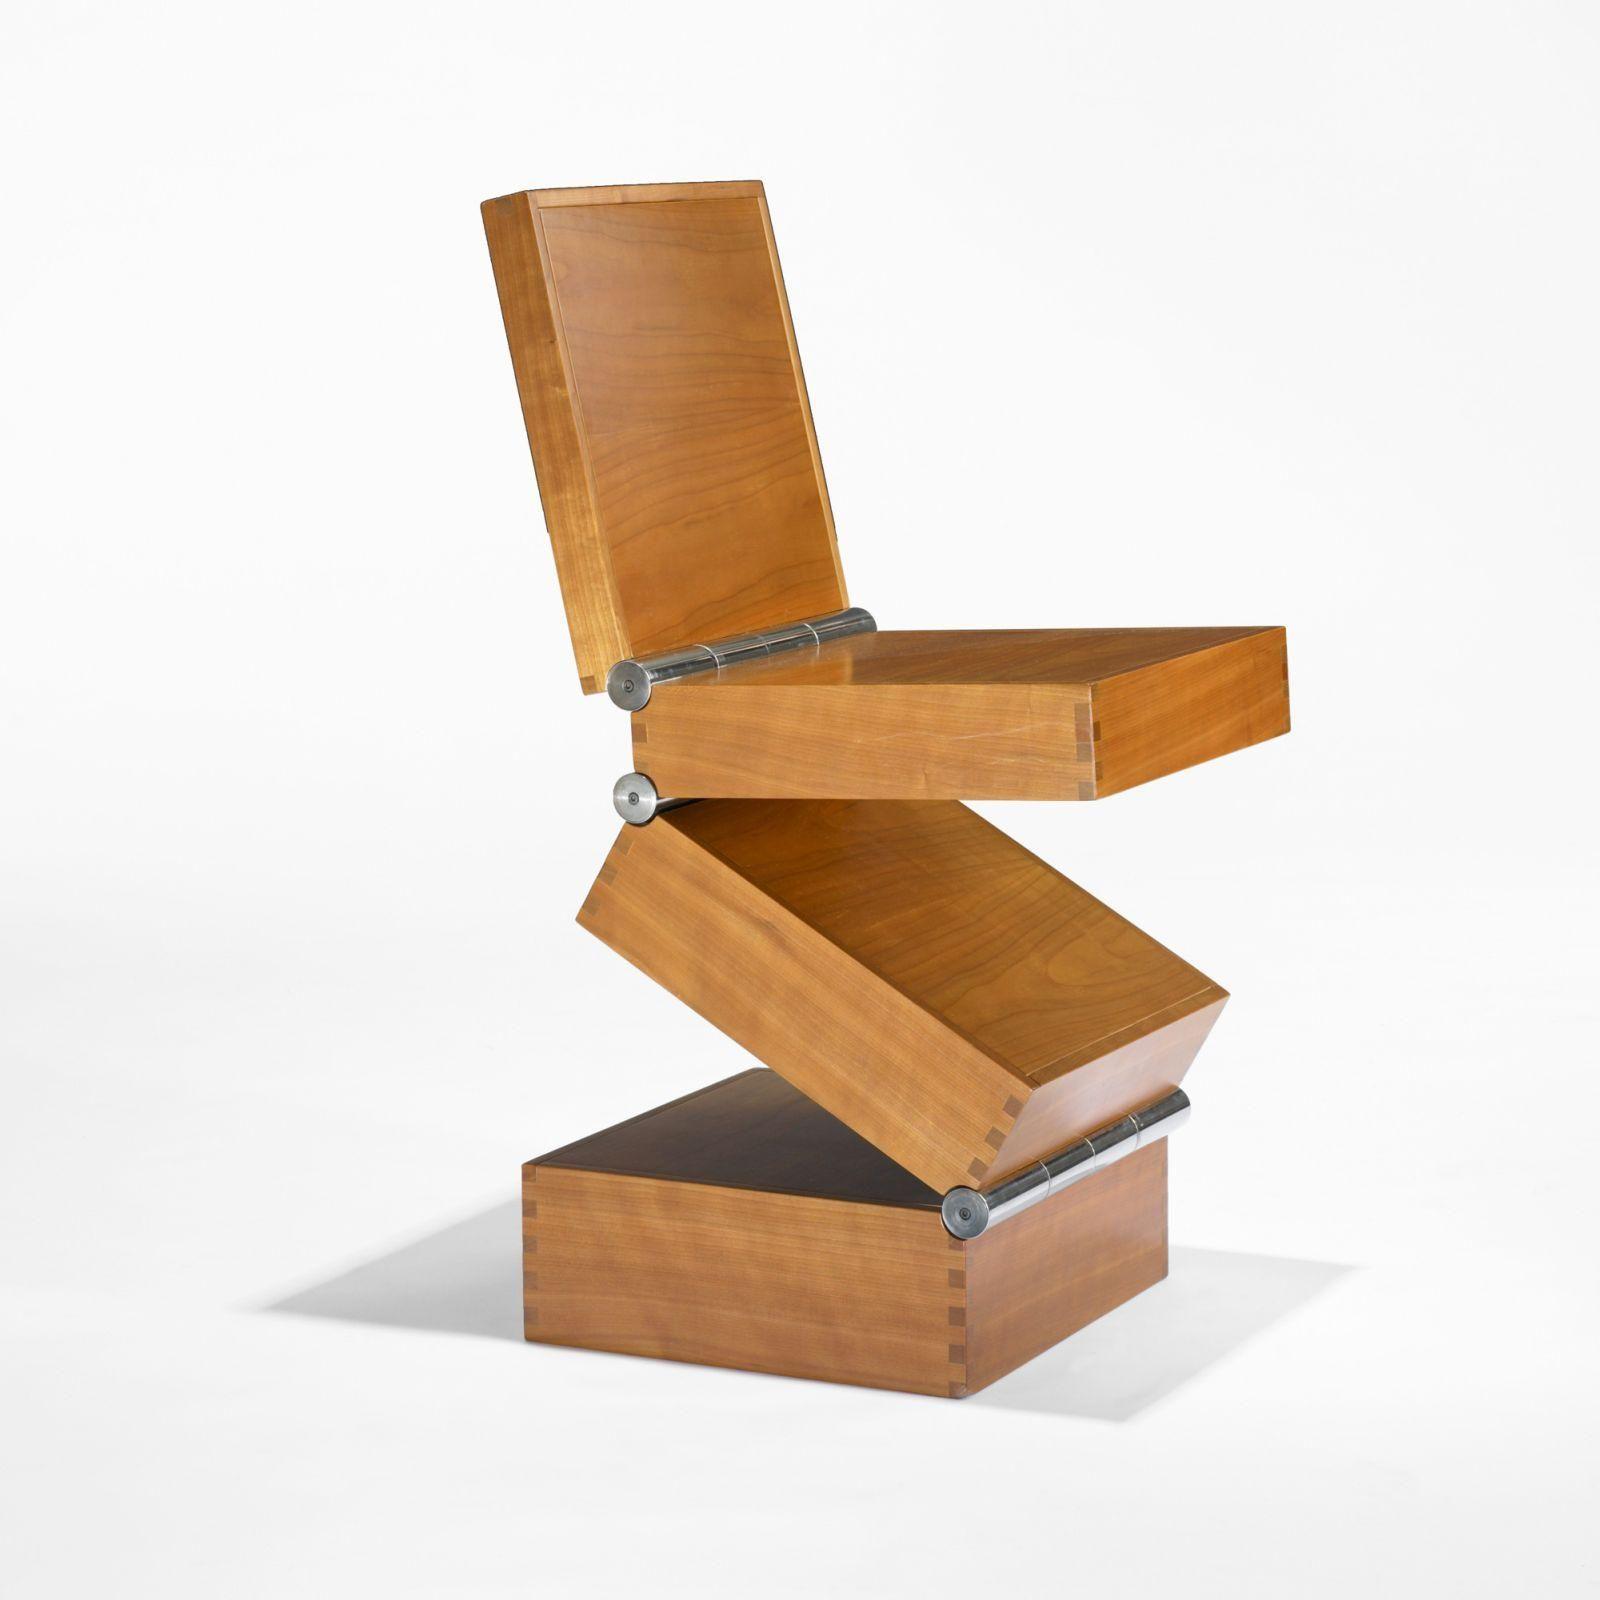 Ron Arad Box In Four Movements Prototype Wood Working Design  # Muebles Raros Del Mundo